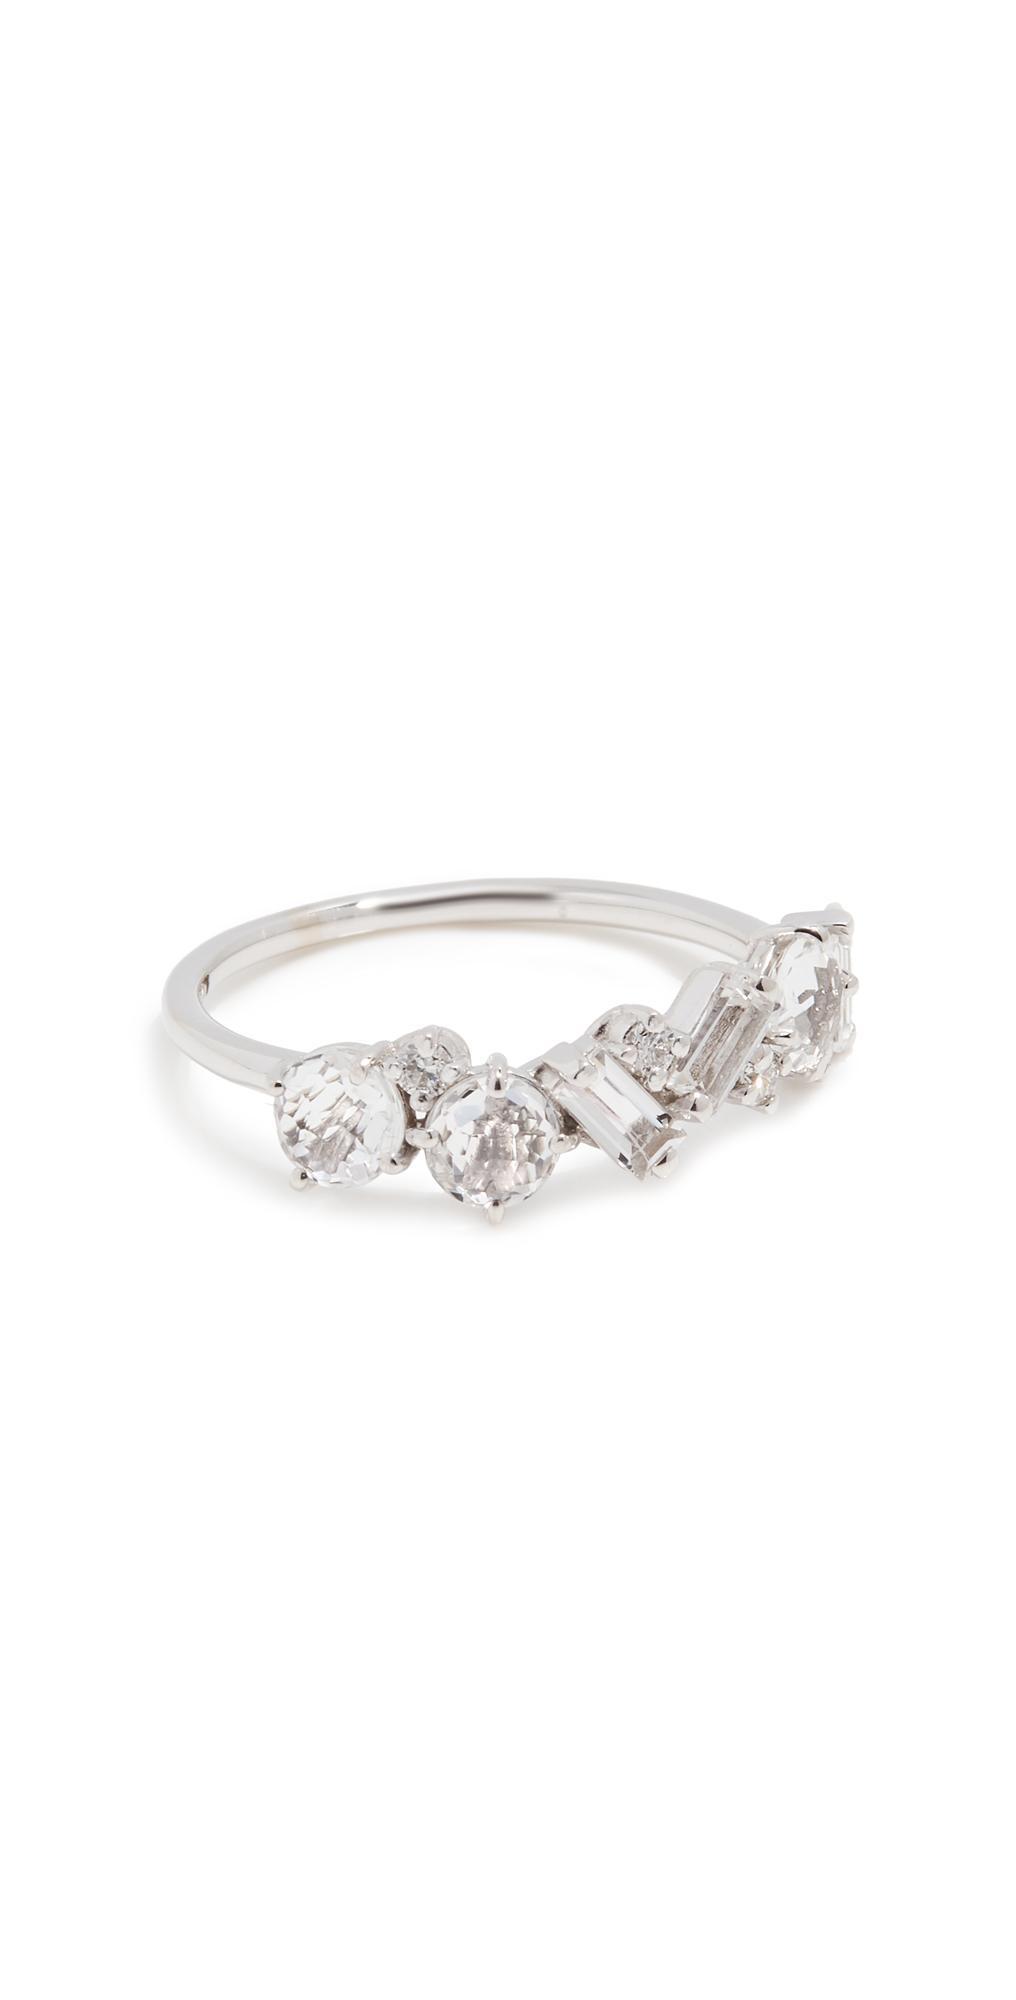 White Topaz and Diamond Cluster Ring